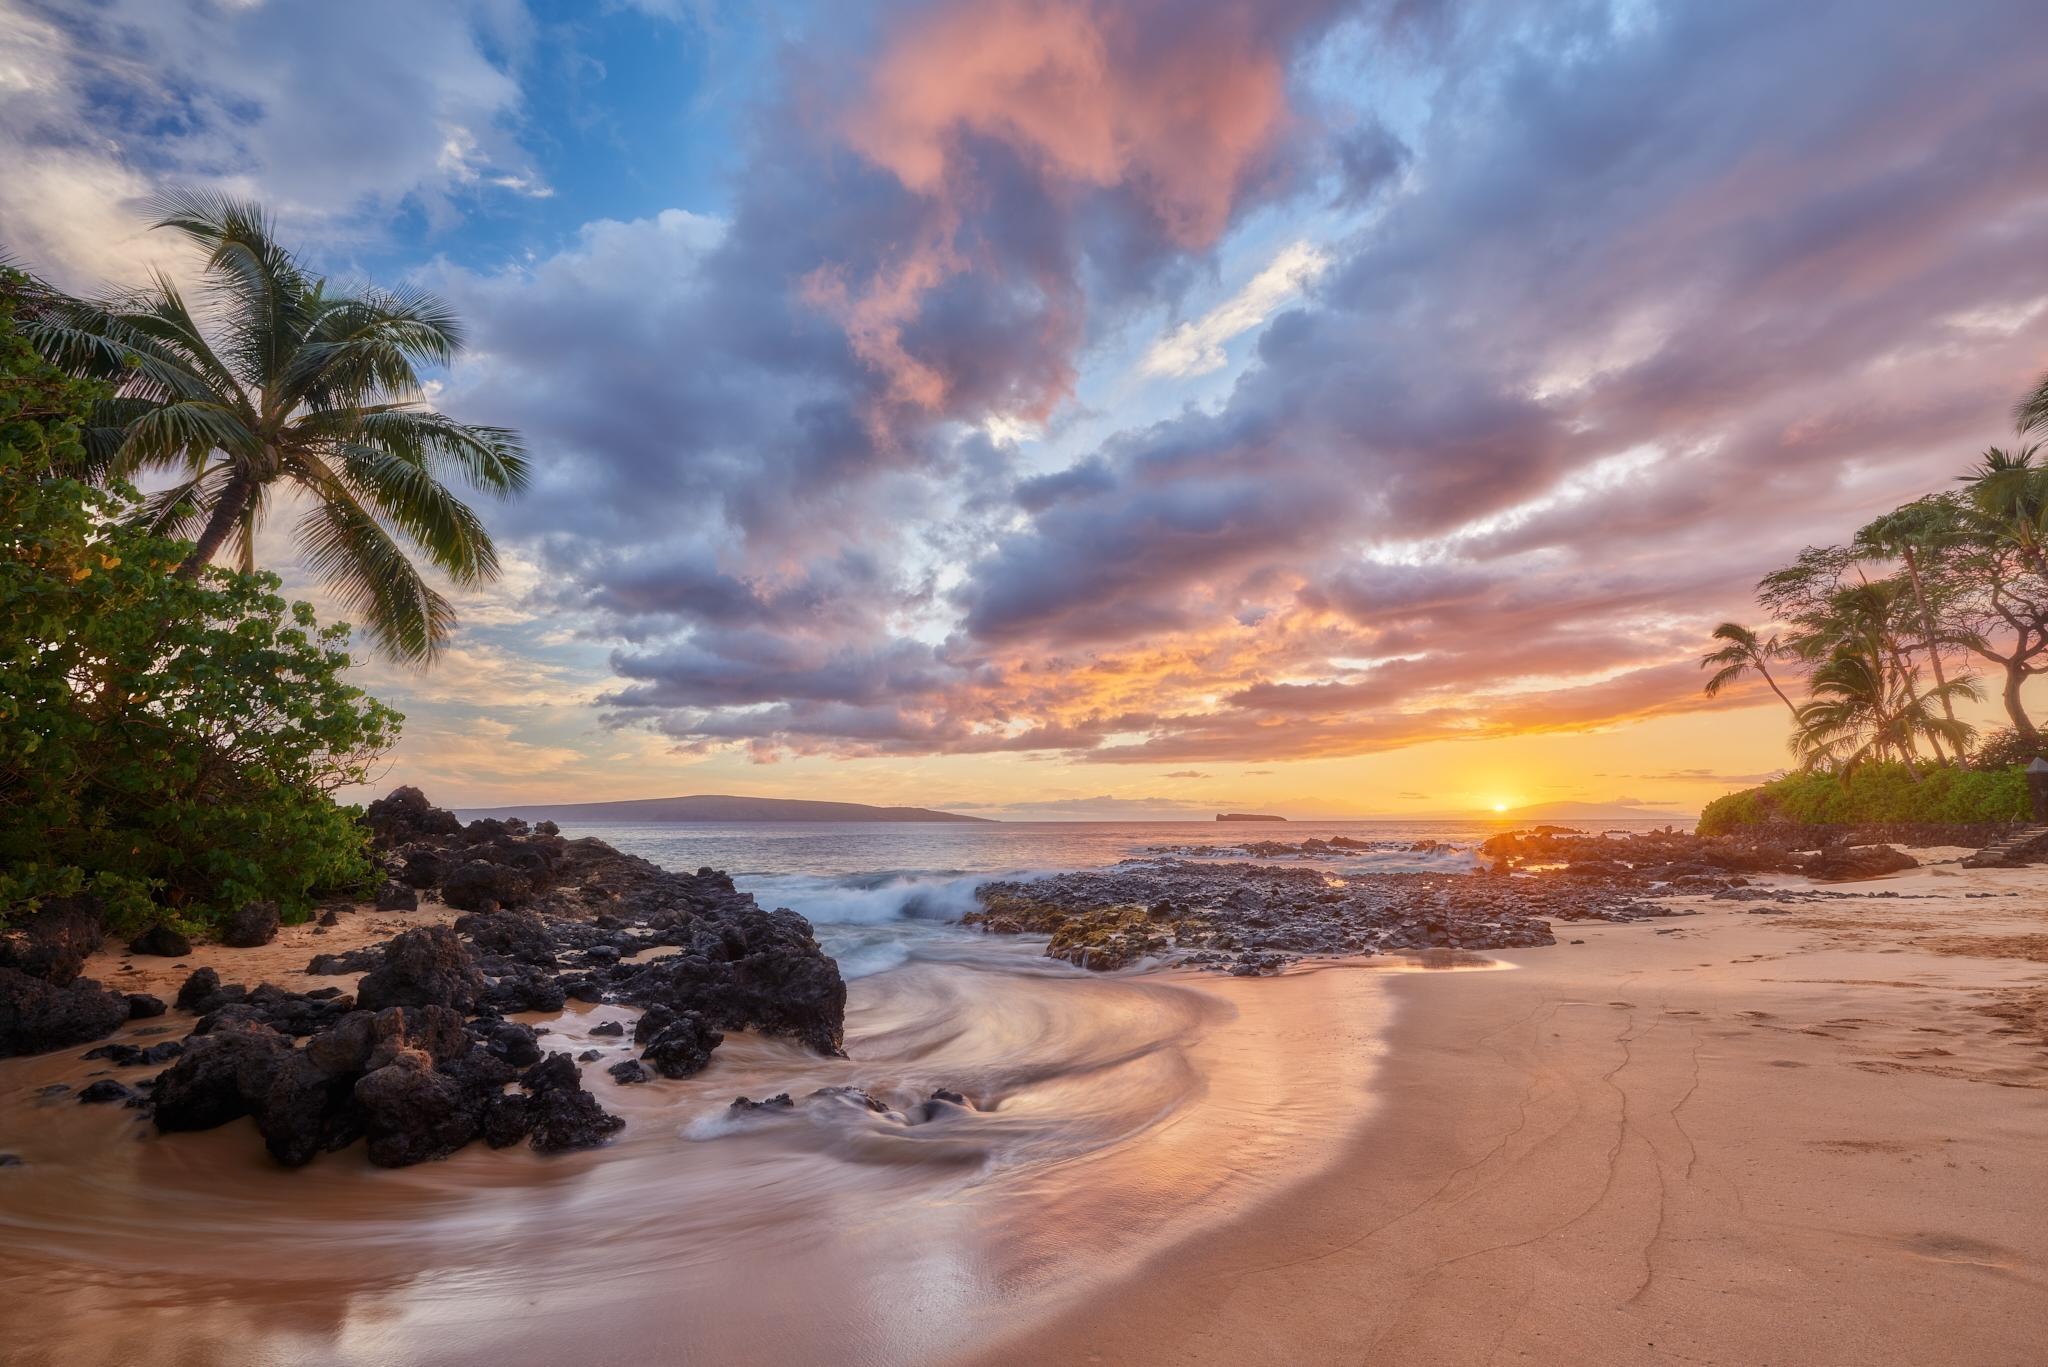 обои закат, море, пальмы, берег картинки фото